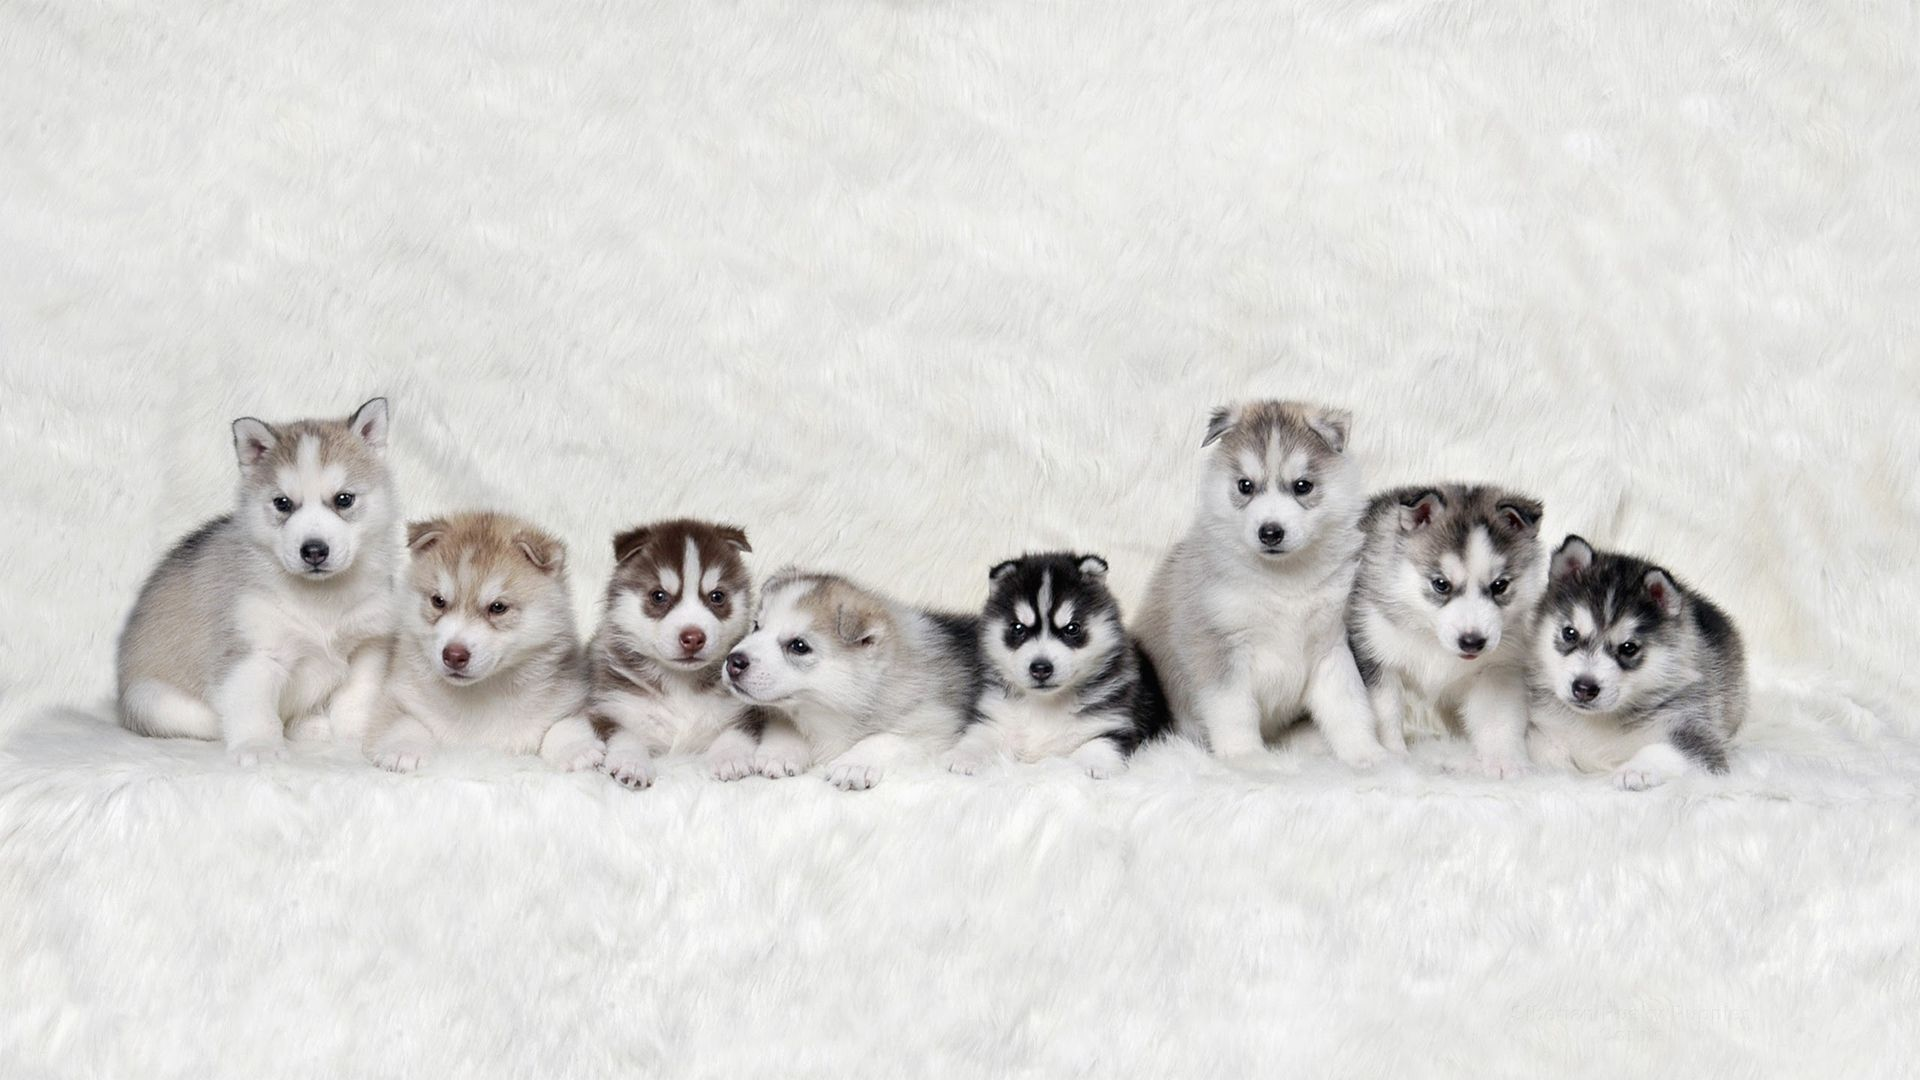 Litter Of Siberian Huskies Adorable 1920 1080 For Your Desktop R Wallpapers Puppy Wallpaper Siberian Husky Puppies Cute Husky Puppies